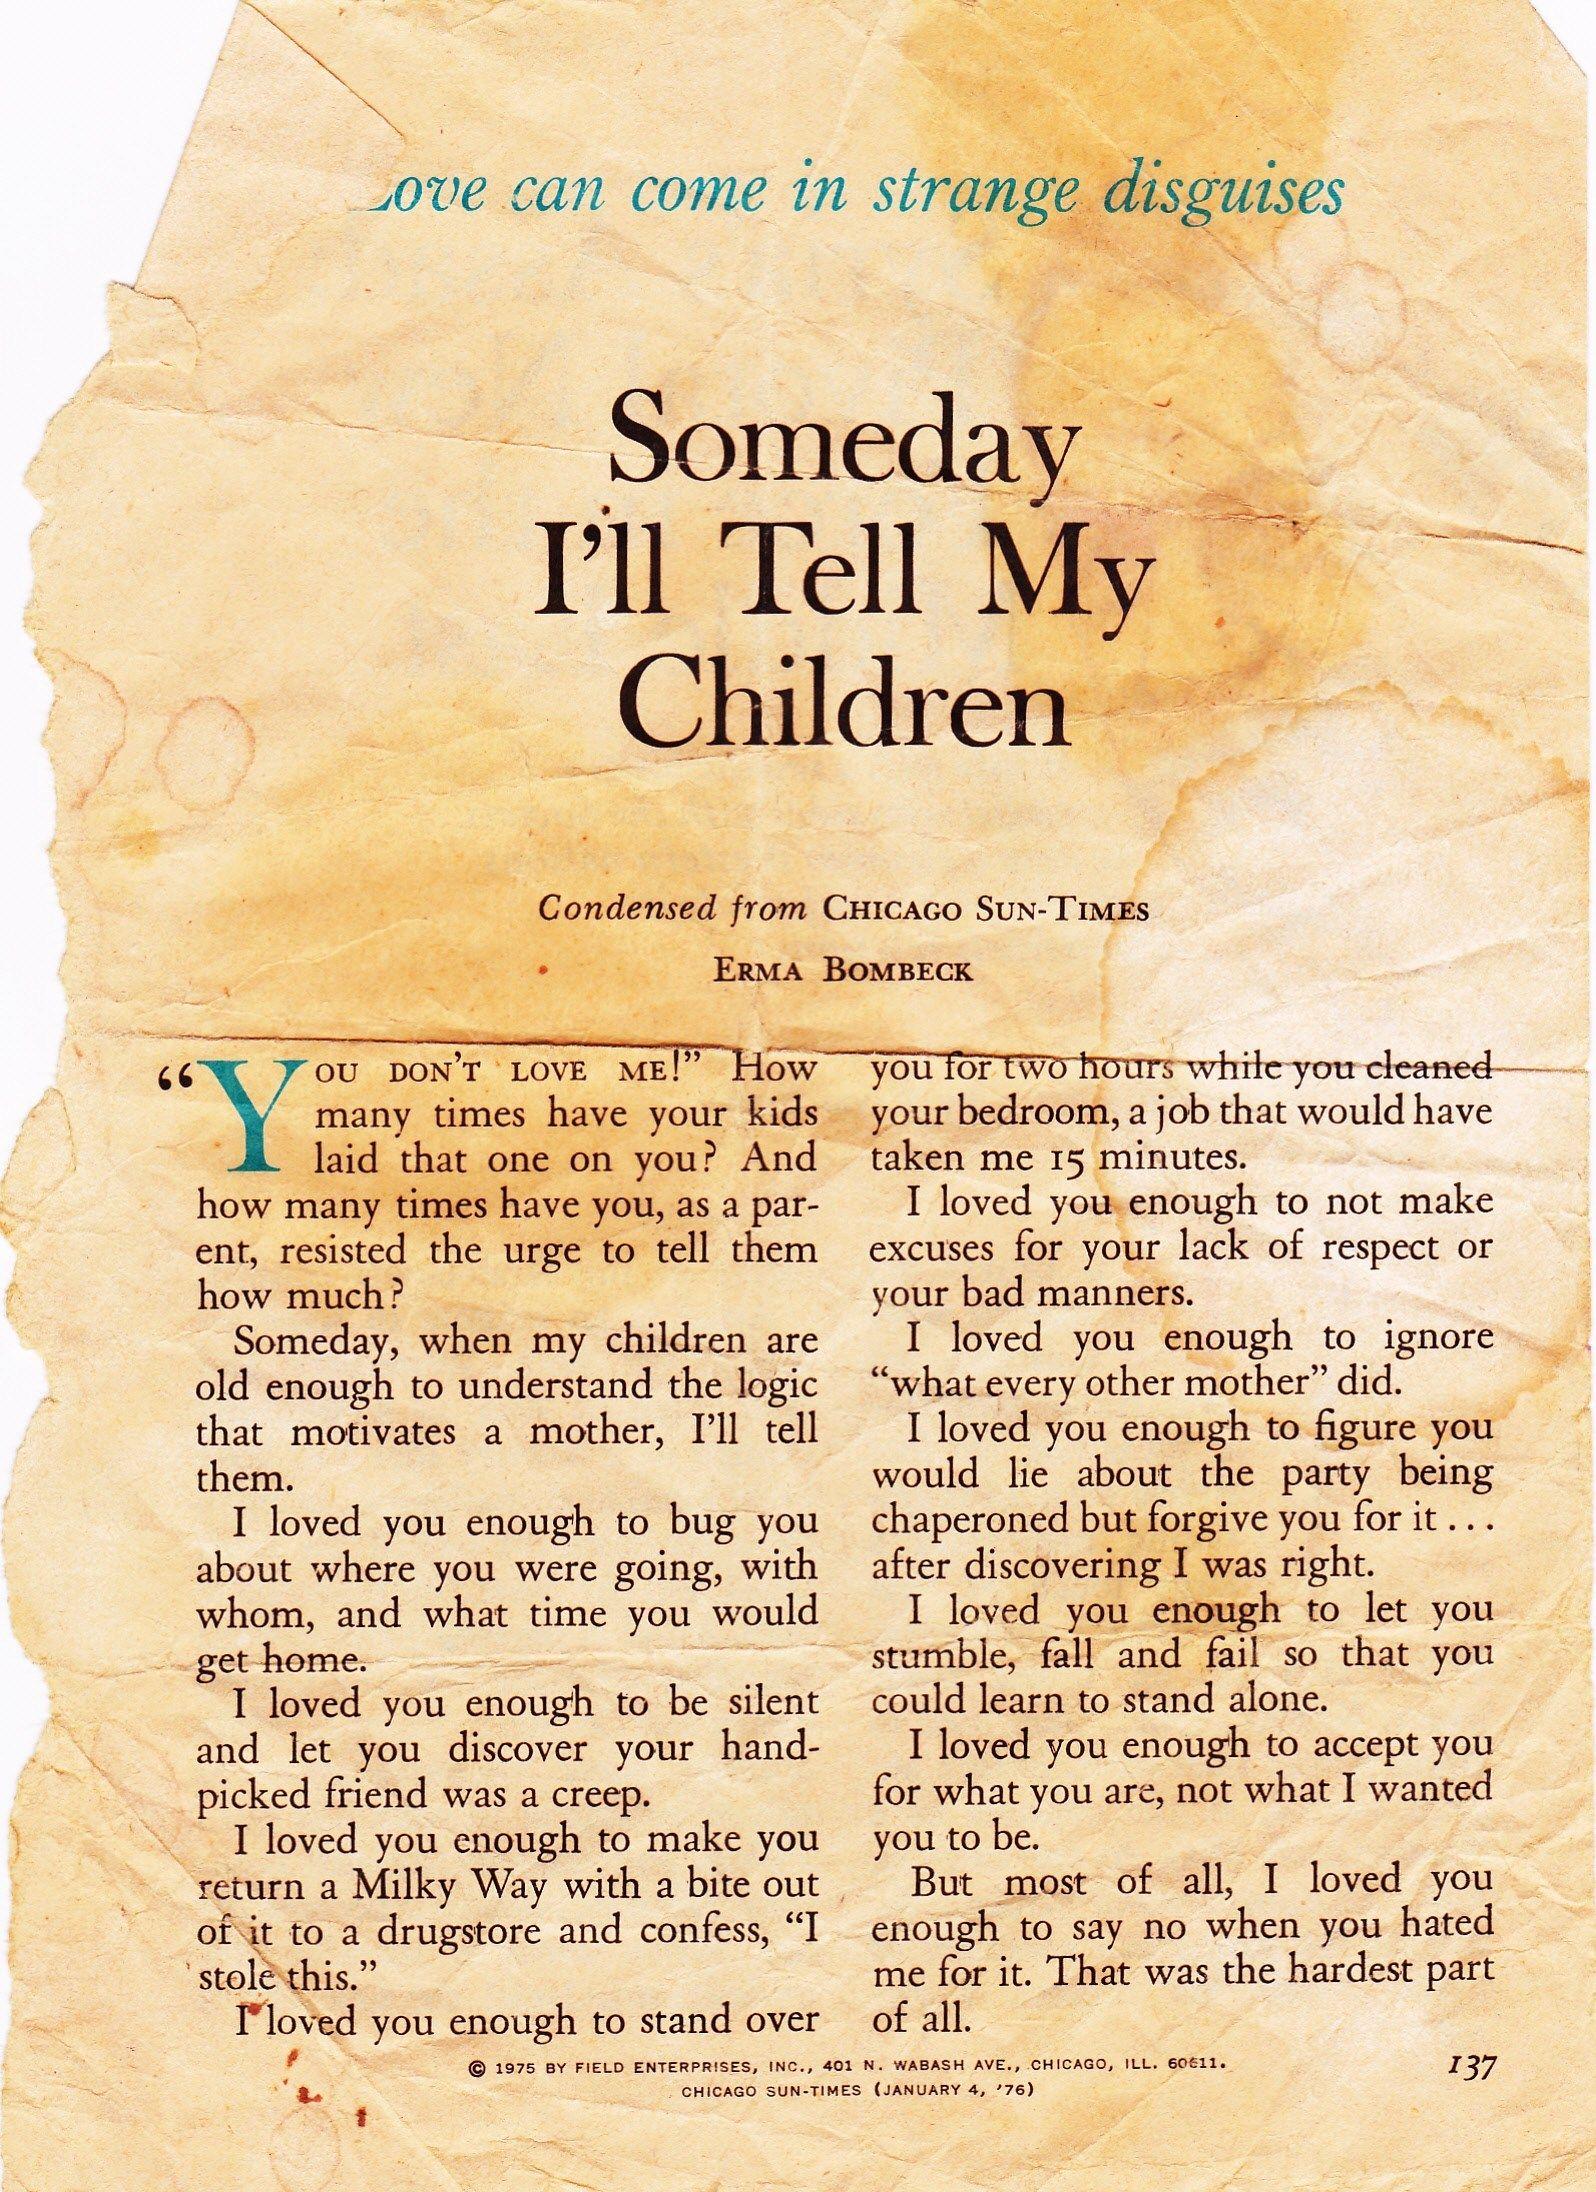 Erma Bombeck - Someday I'll Tell My Children